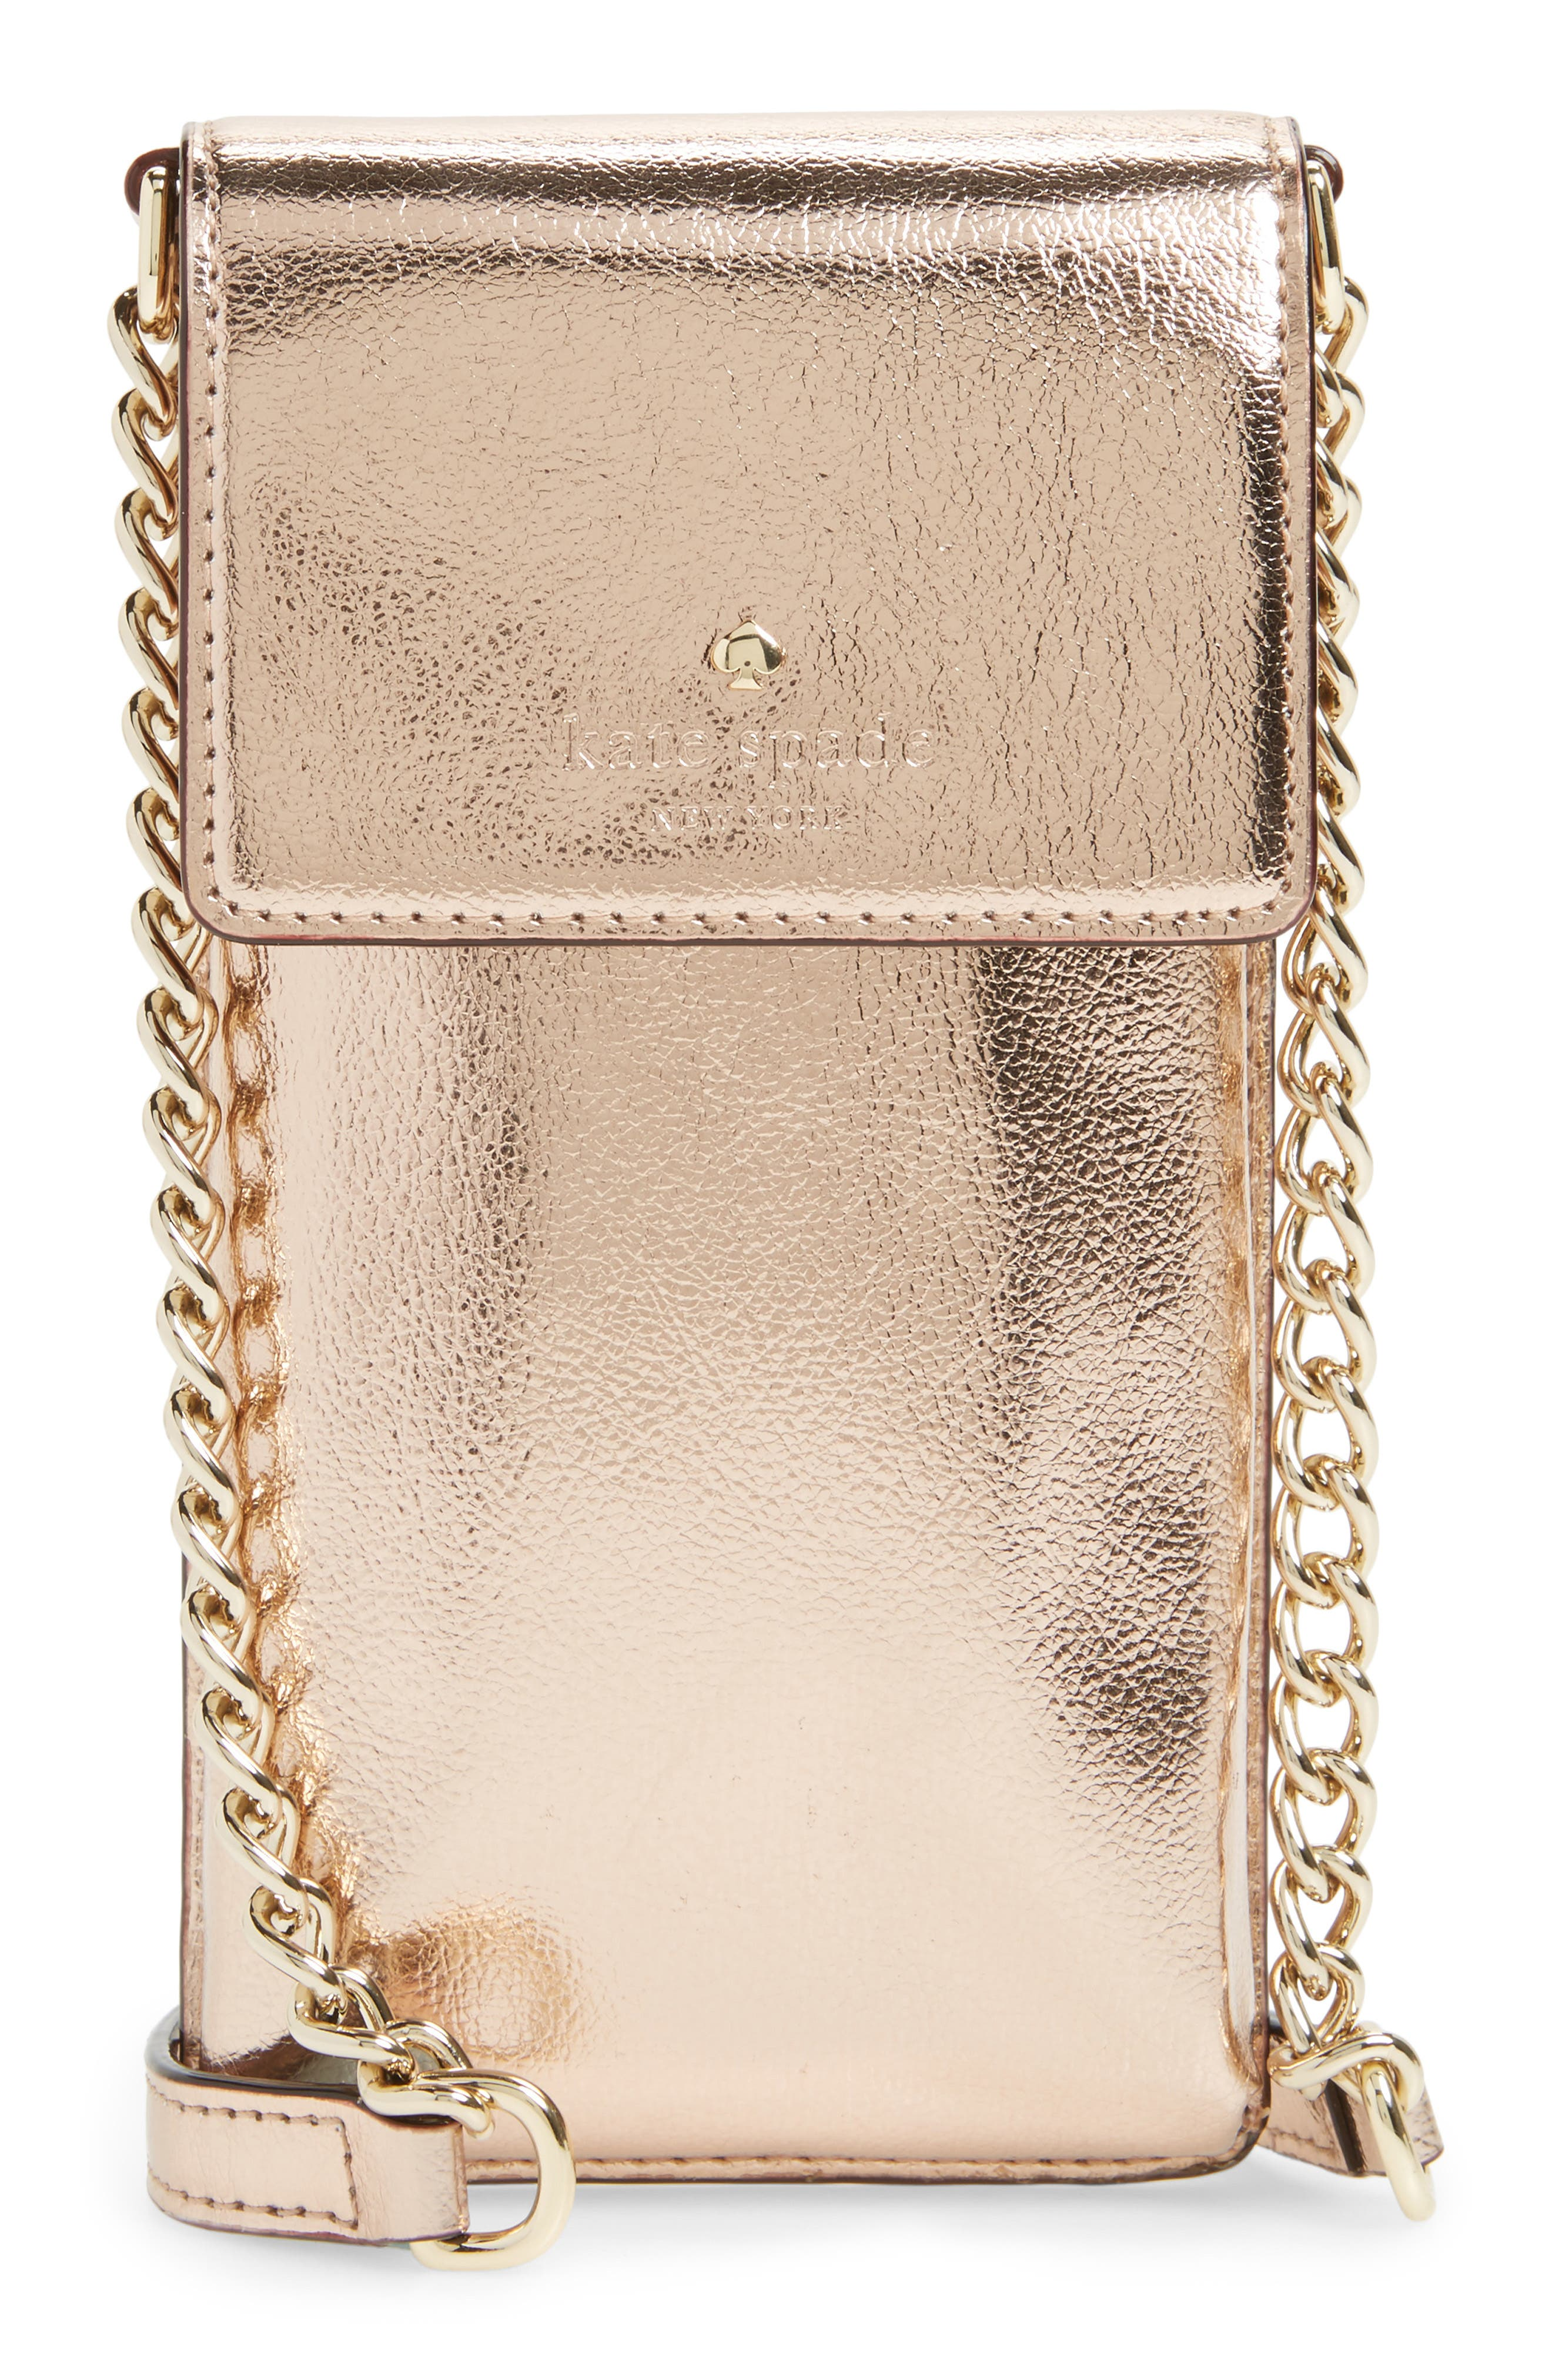 kate spade new york metallic leather smartphone crossbody bag